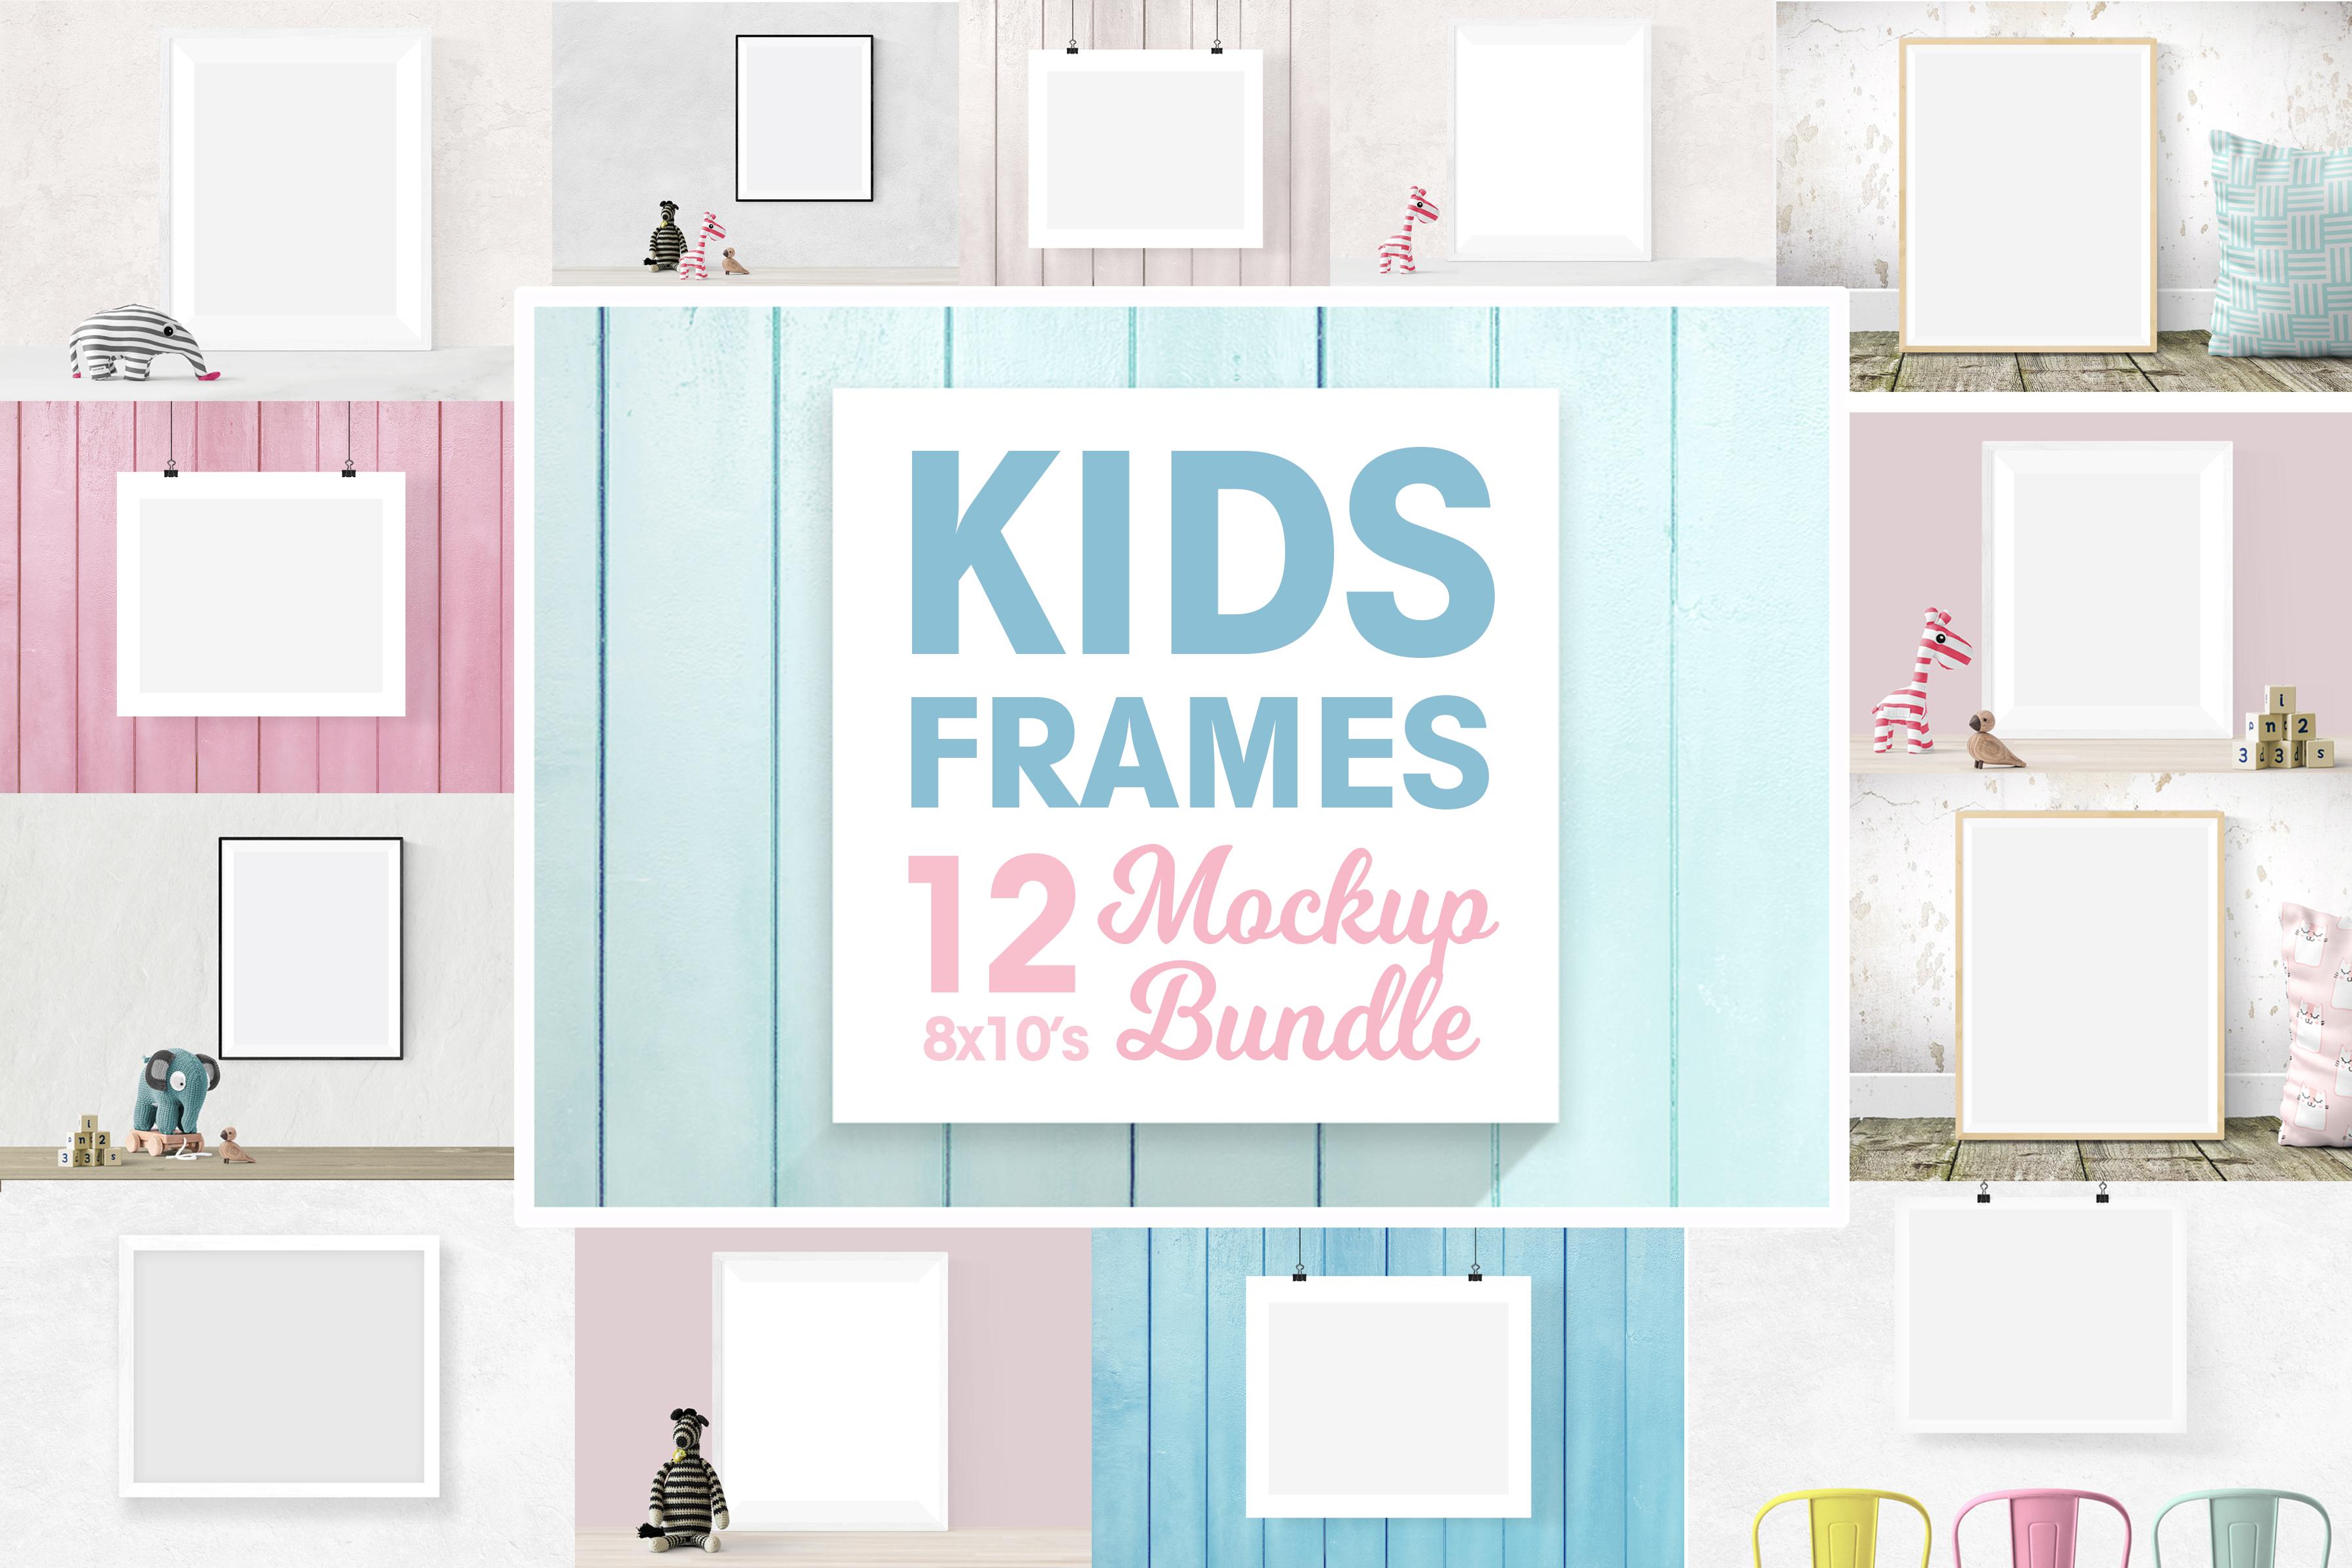 Kids frame mockup 8x10 bundle   nursery frames example image 1